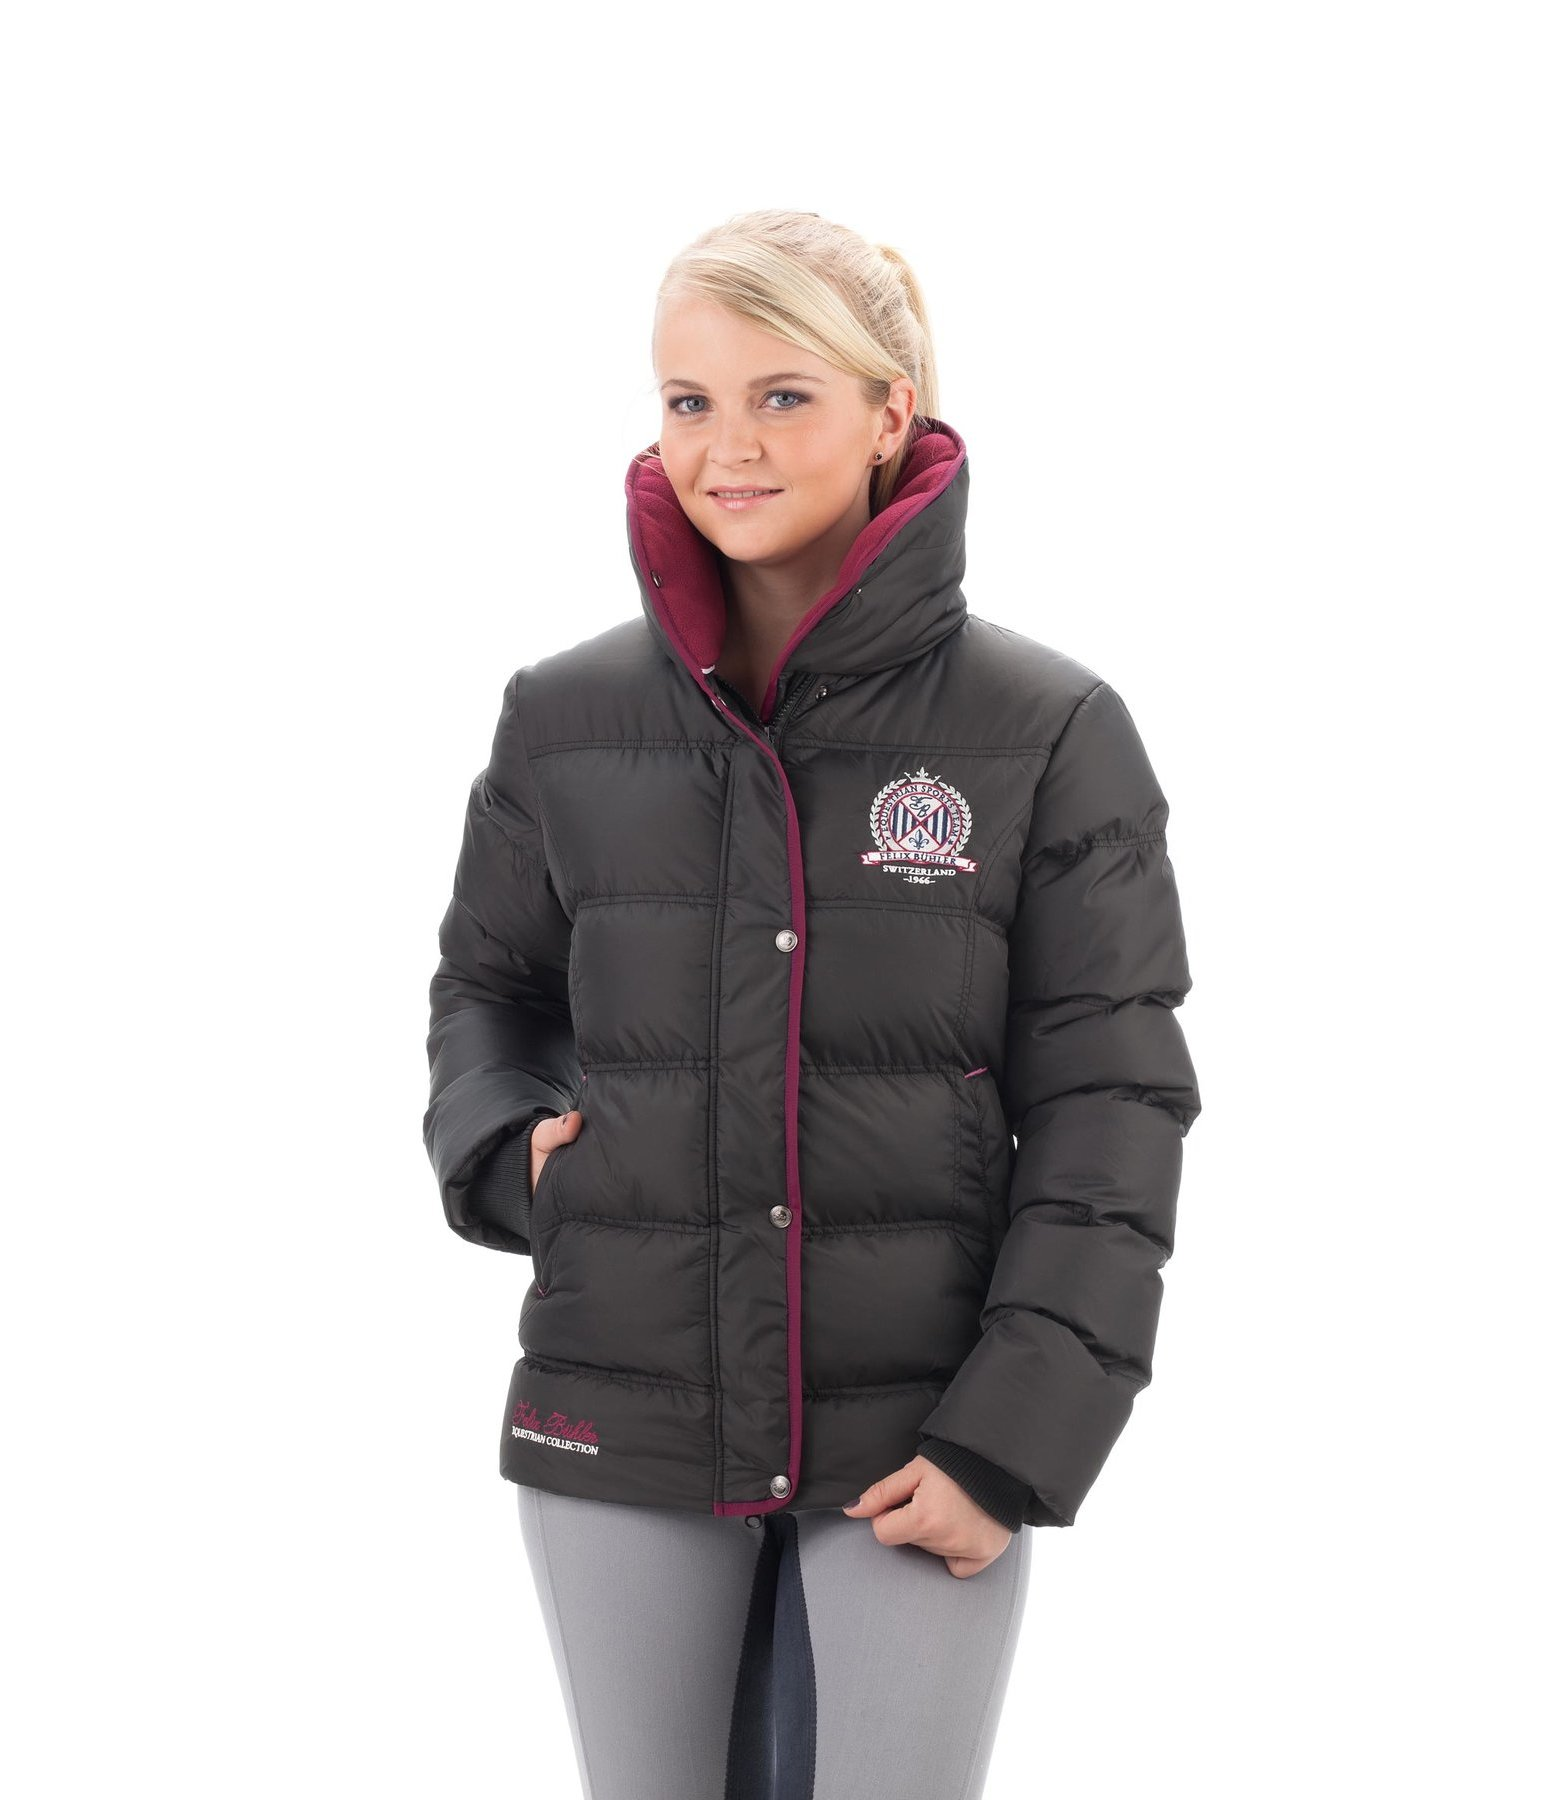 riding jacket miri riding jackets kramer equestrian. Black Bedroom Furniture Sets. Home Design Ideas